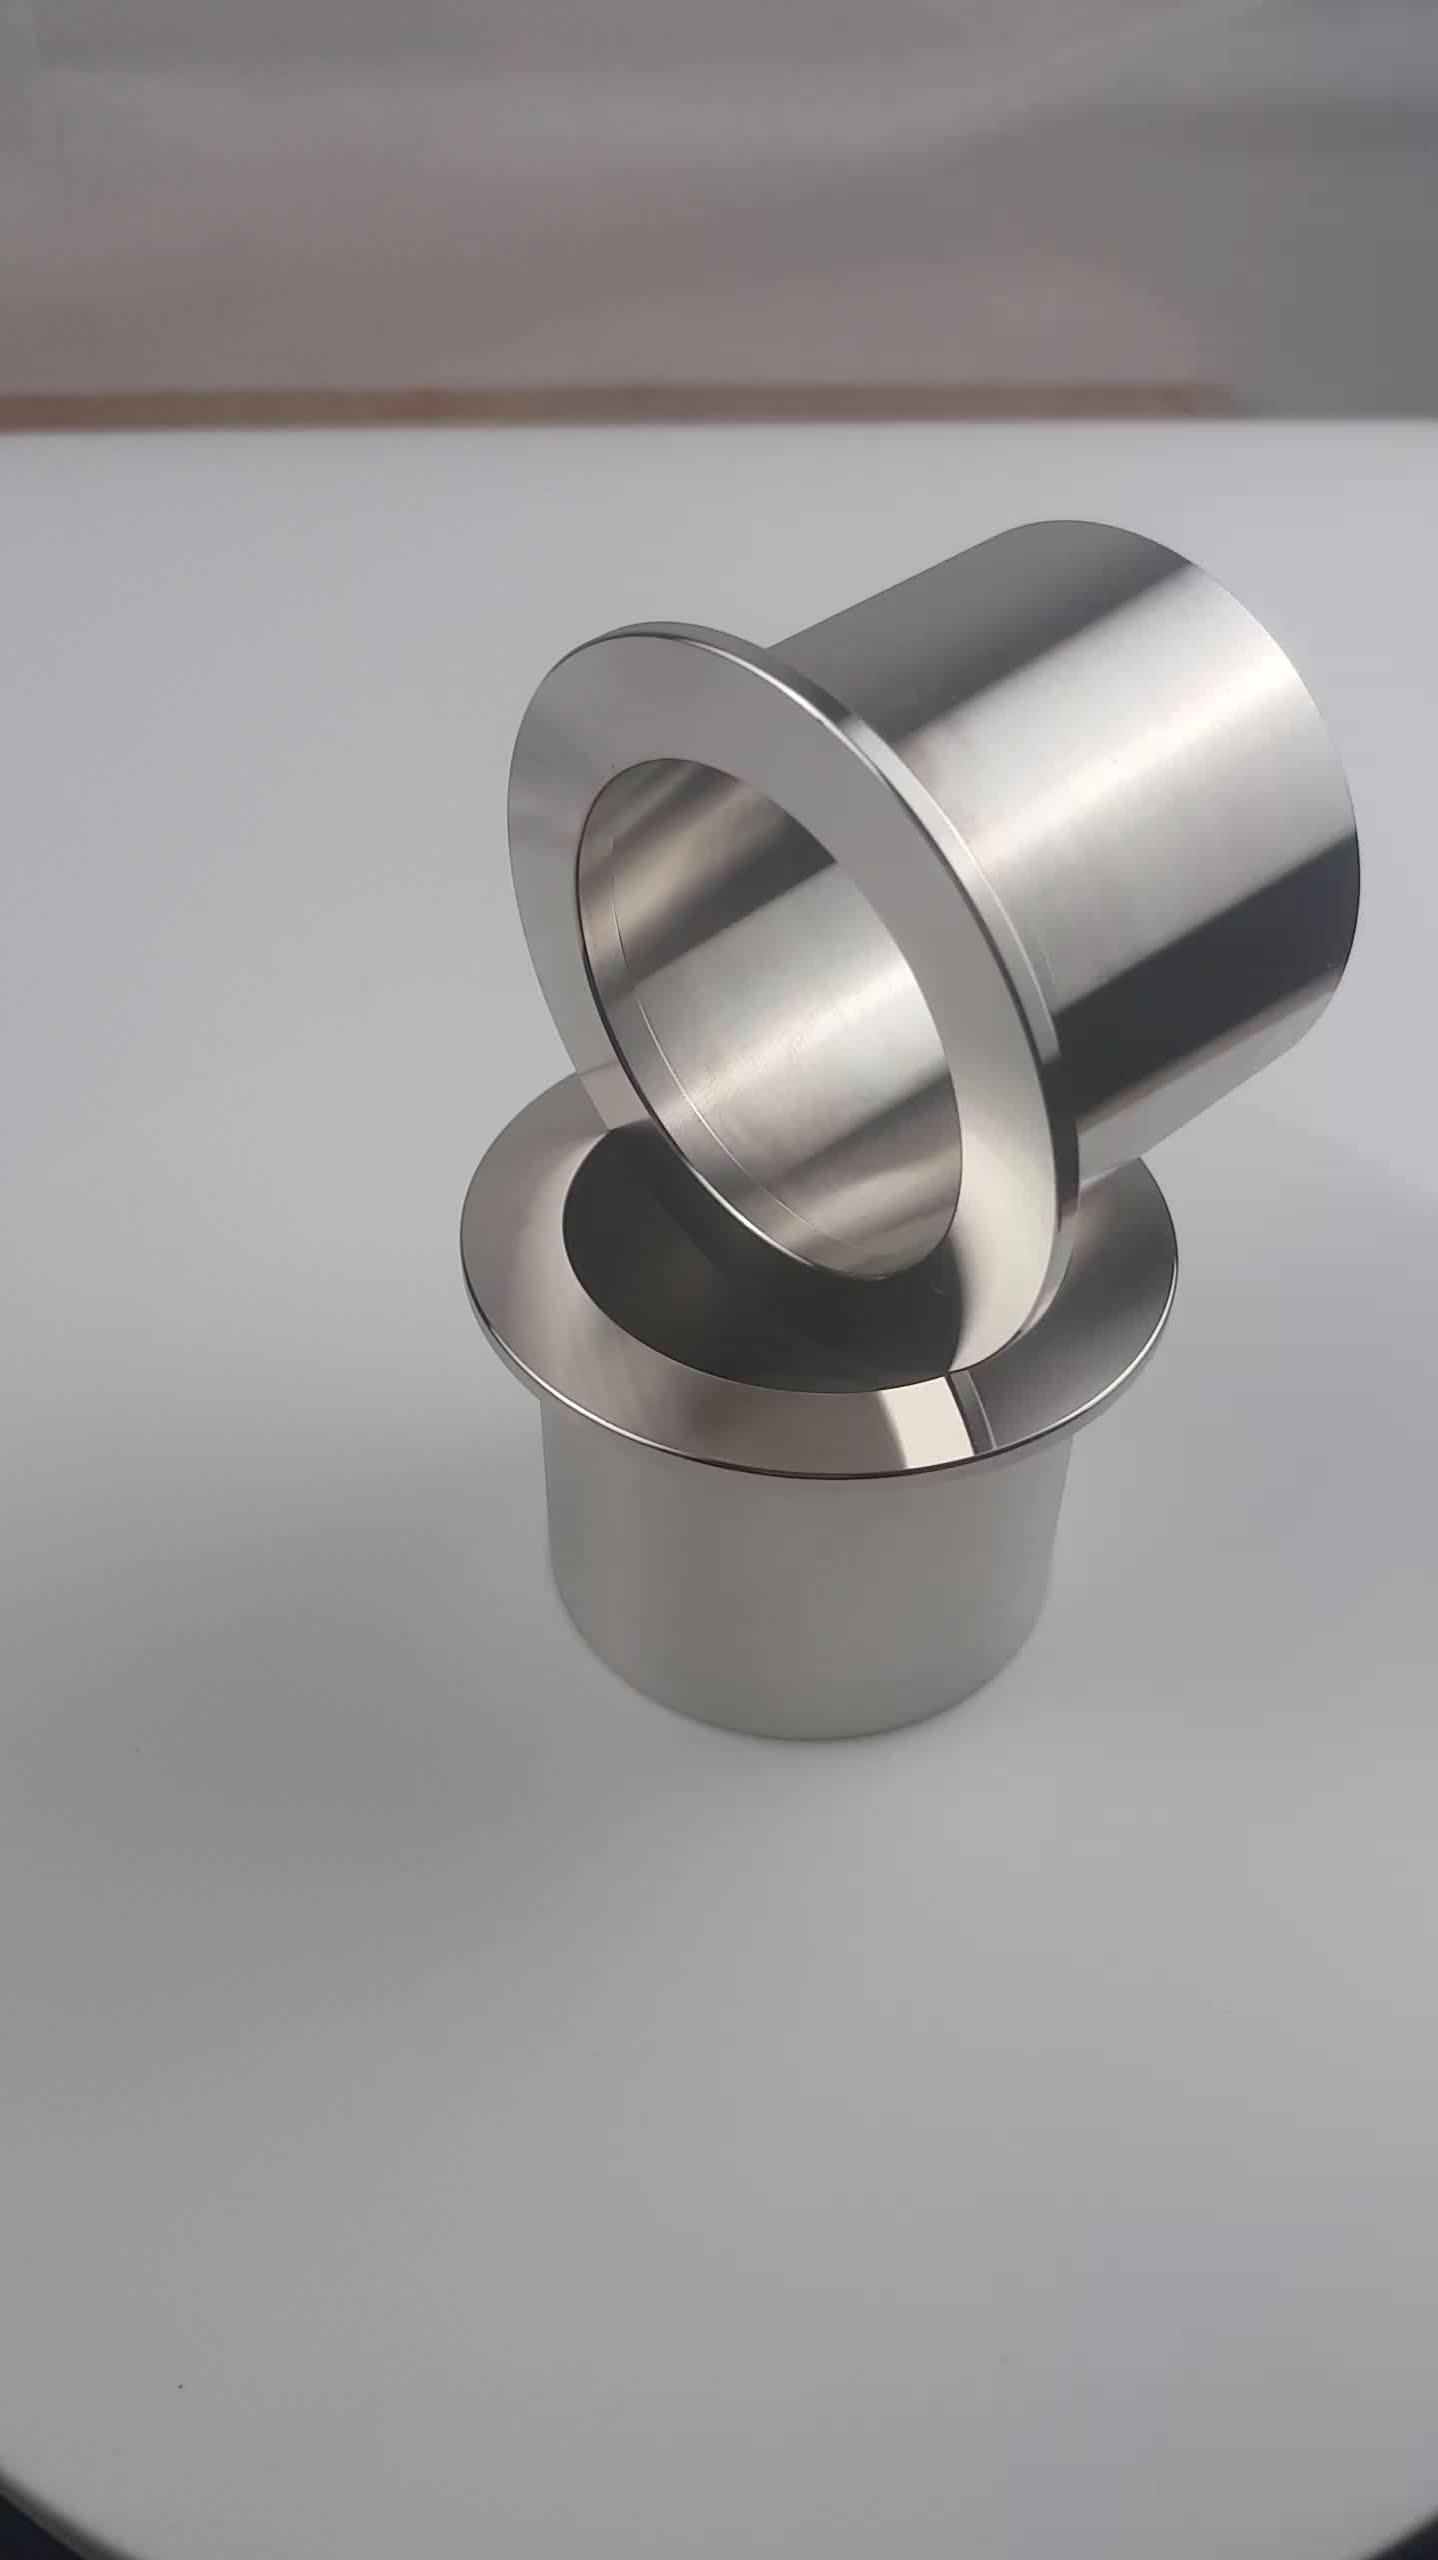 KF QF NW vacuum half nipple KF16 KF25 KF40 KF50 made by stainless steel